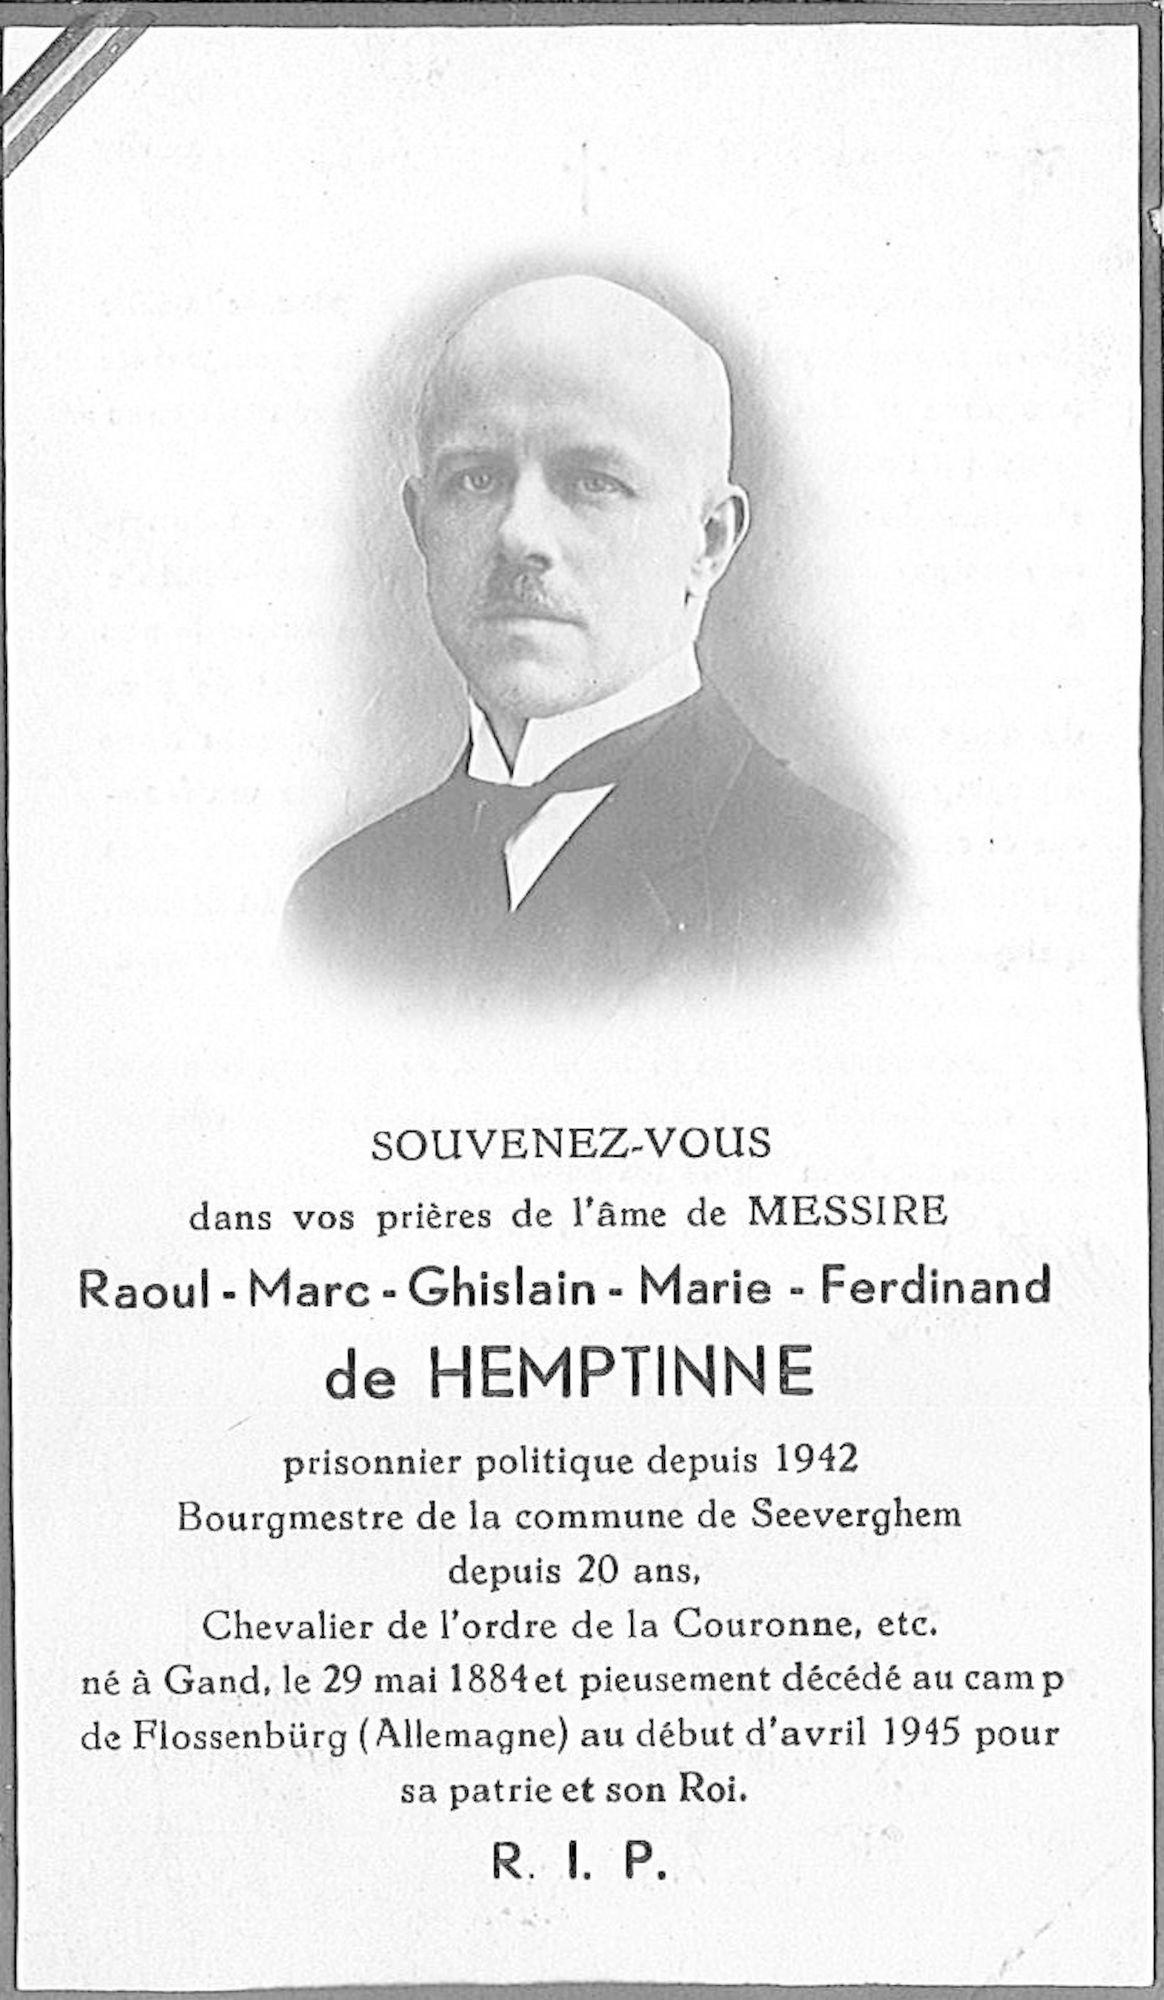 Raoul-Marc-Ghislain-Marie-Ferdinand de Hemptinne